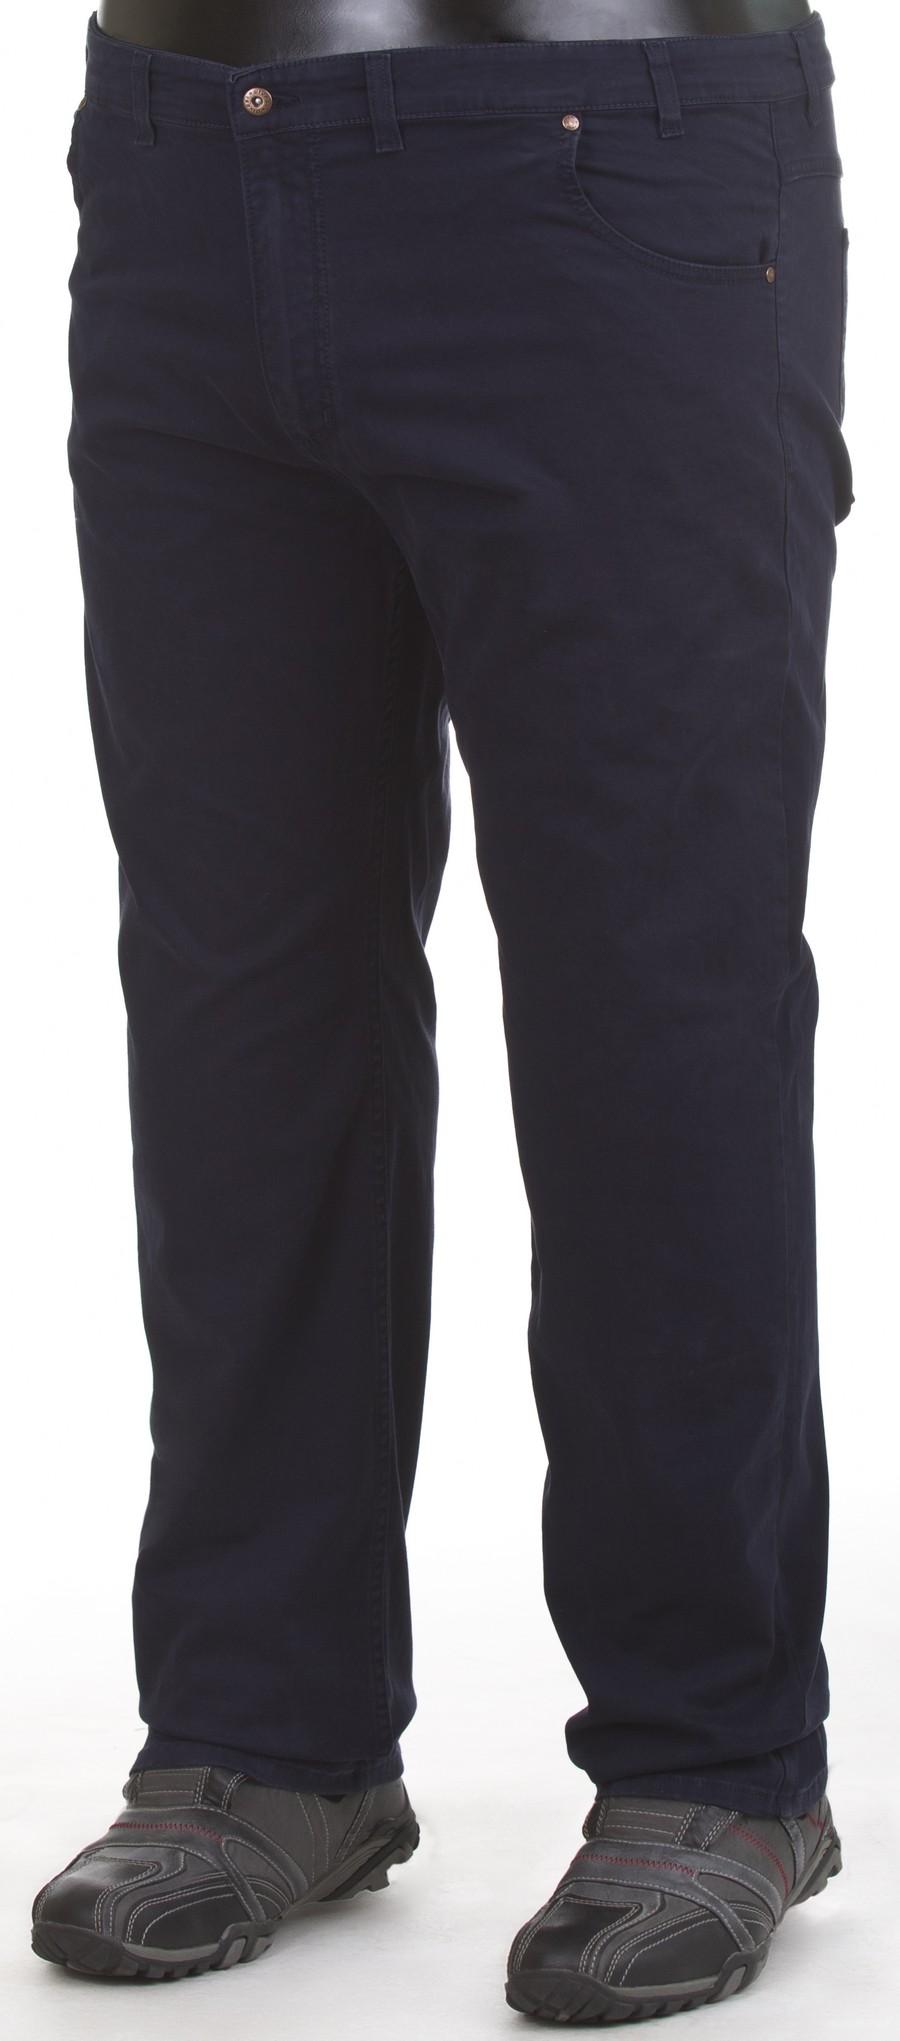 Viking spodnie 3XL 4XL 5XL 6XL 7XL 8XL